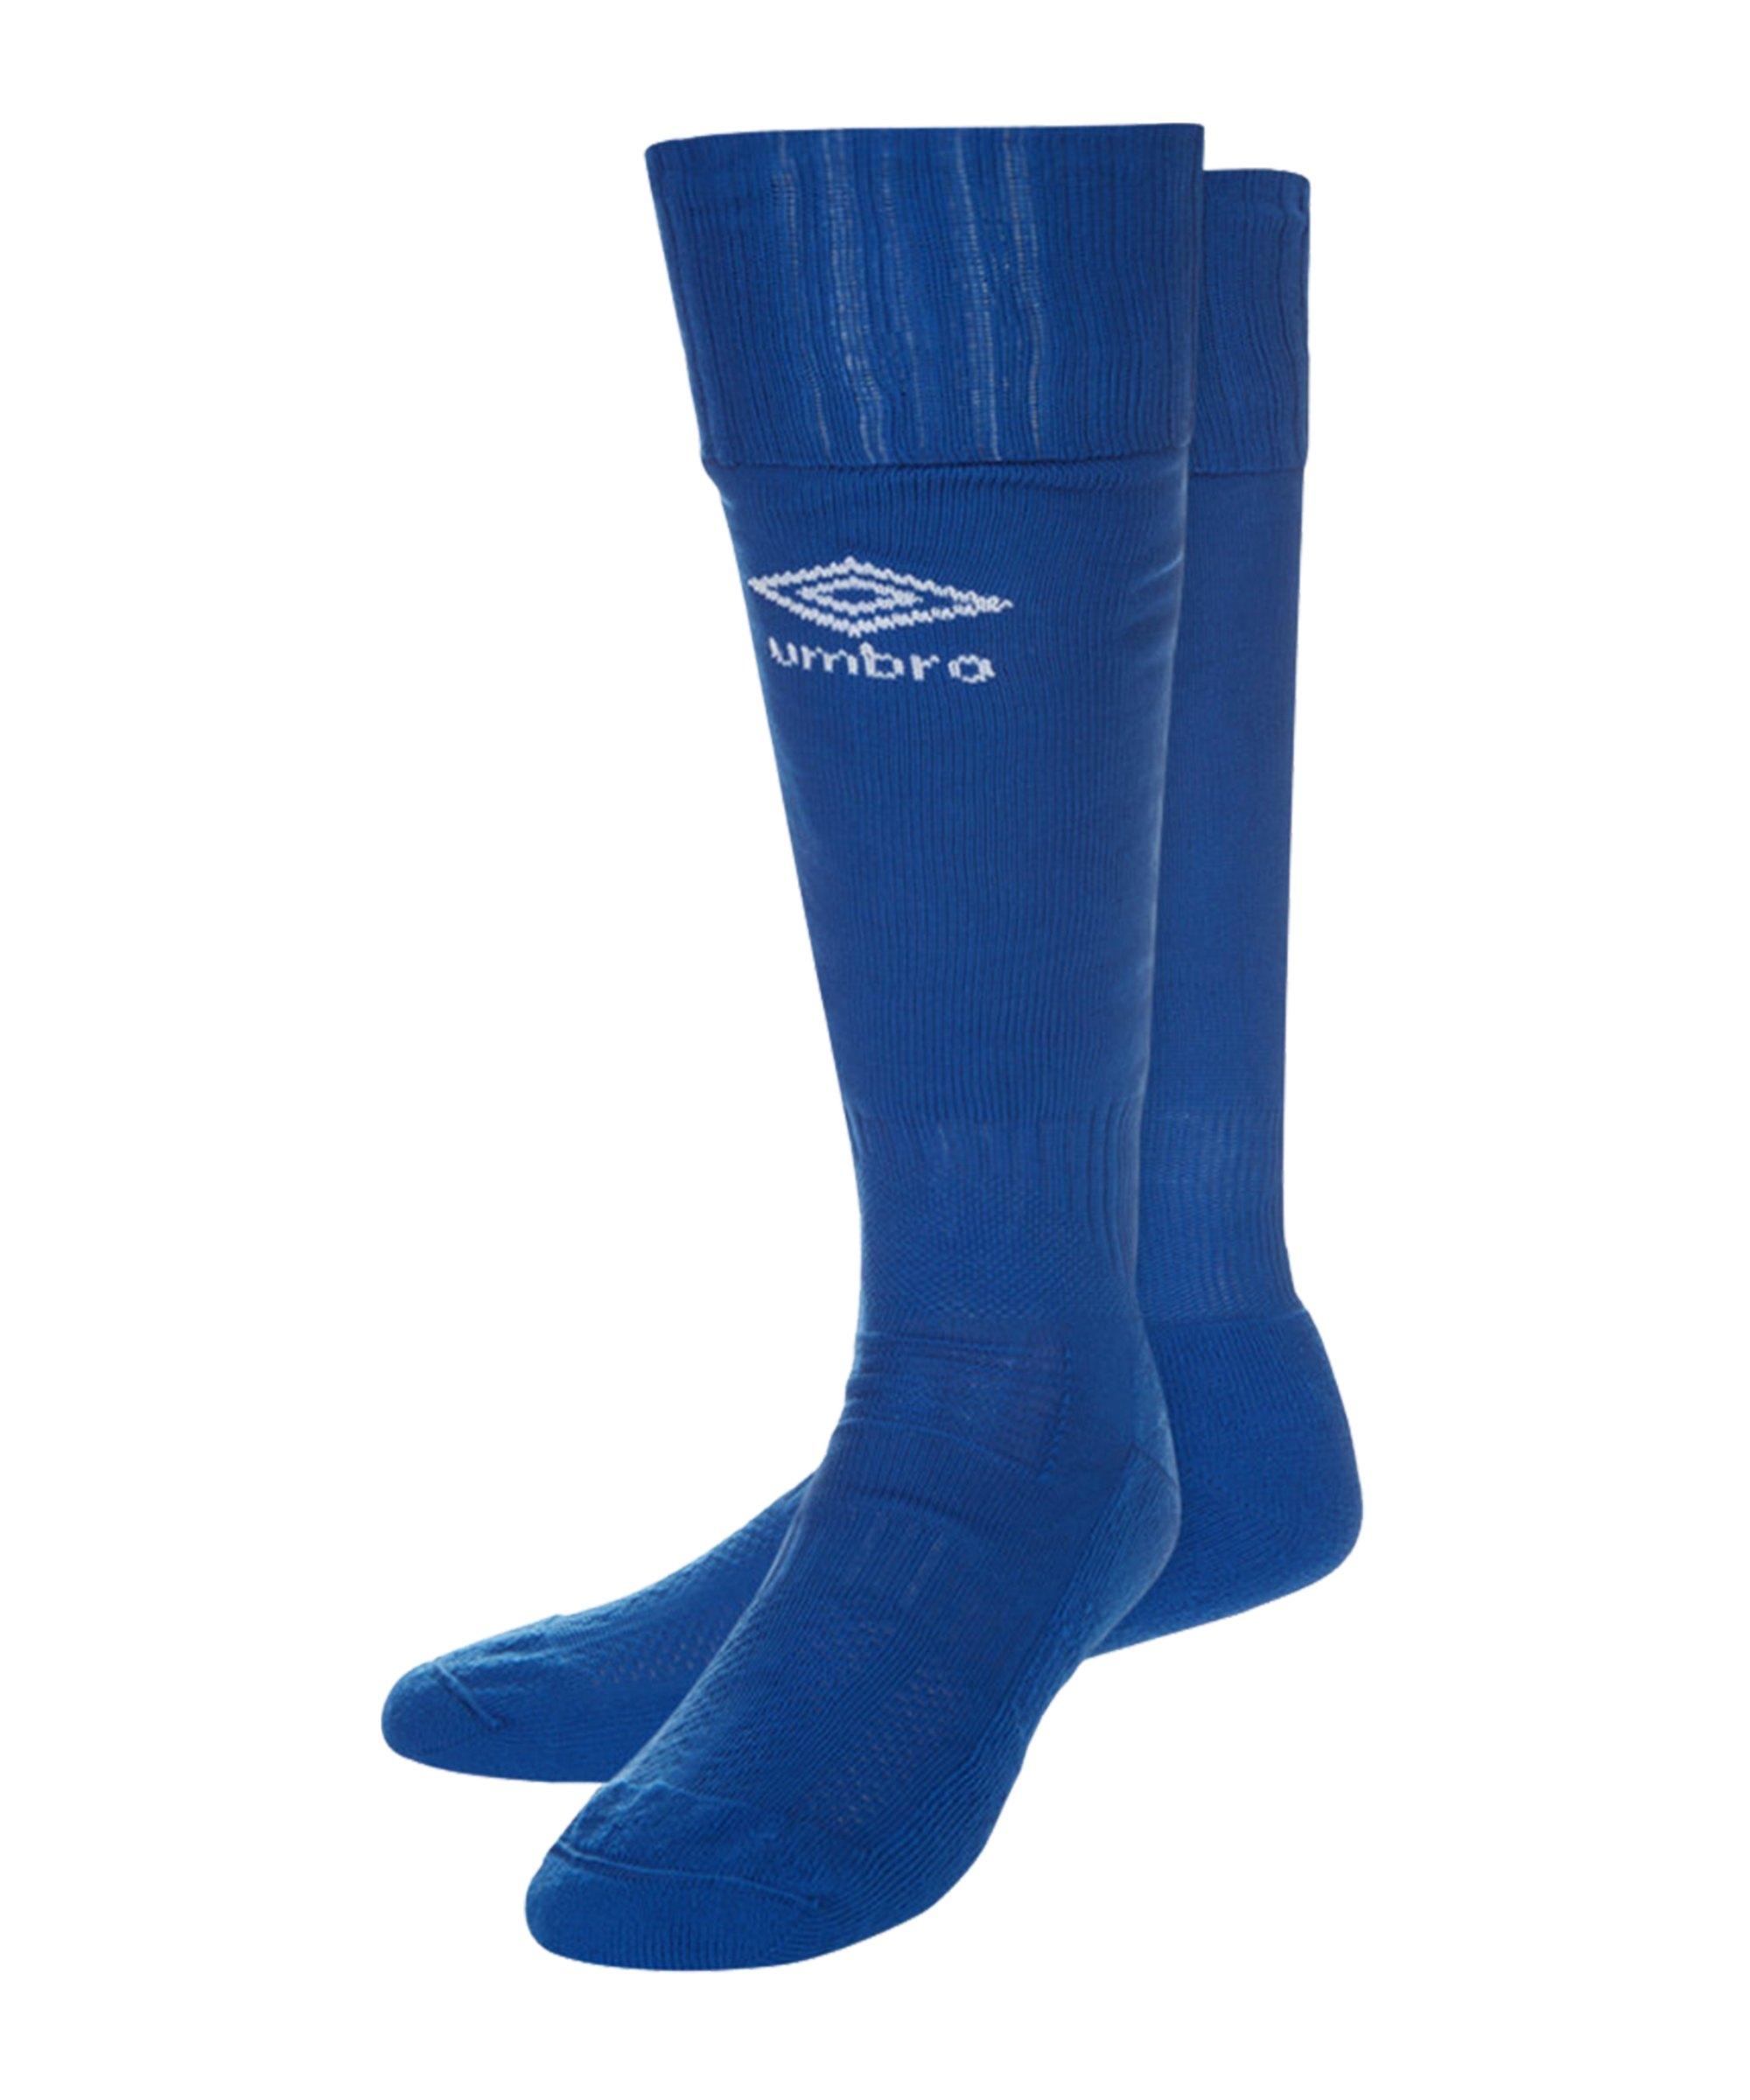 Umbro Primo Strumpfstutzen Blau FDX4 - blau